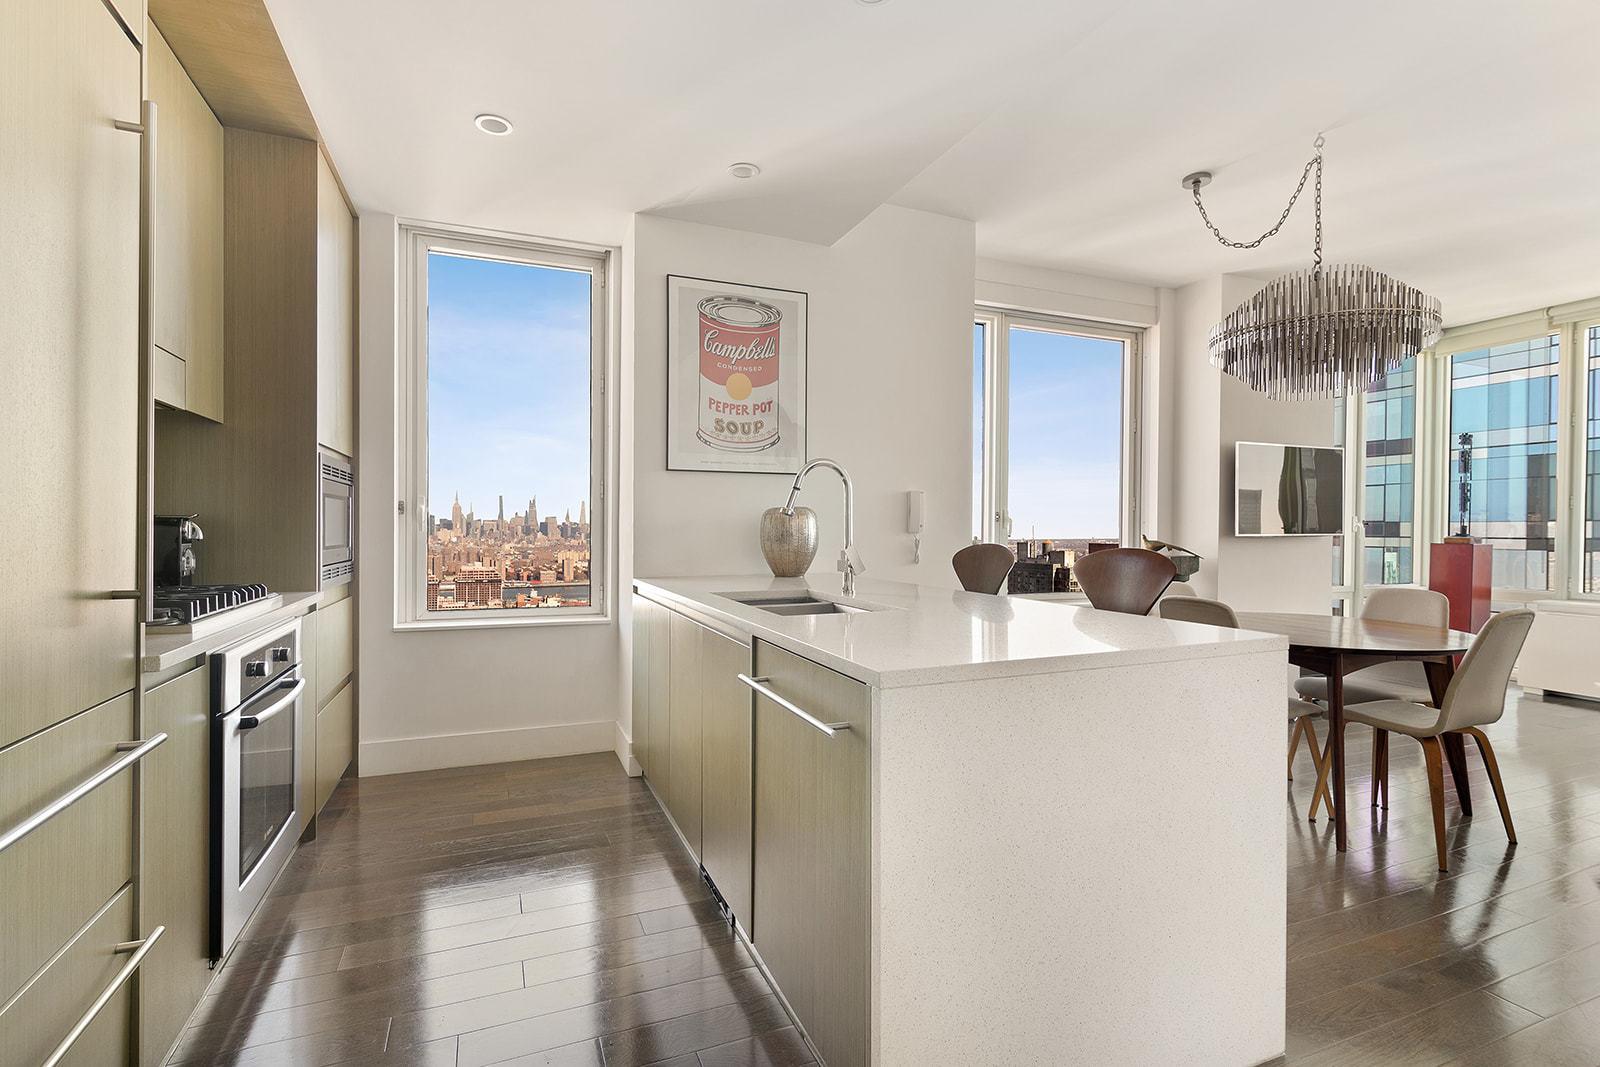 Apartment for sale at 388 Bridge Street, Apt 43-G